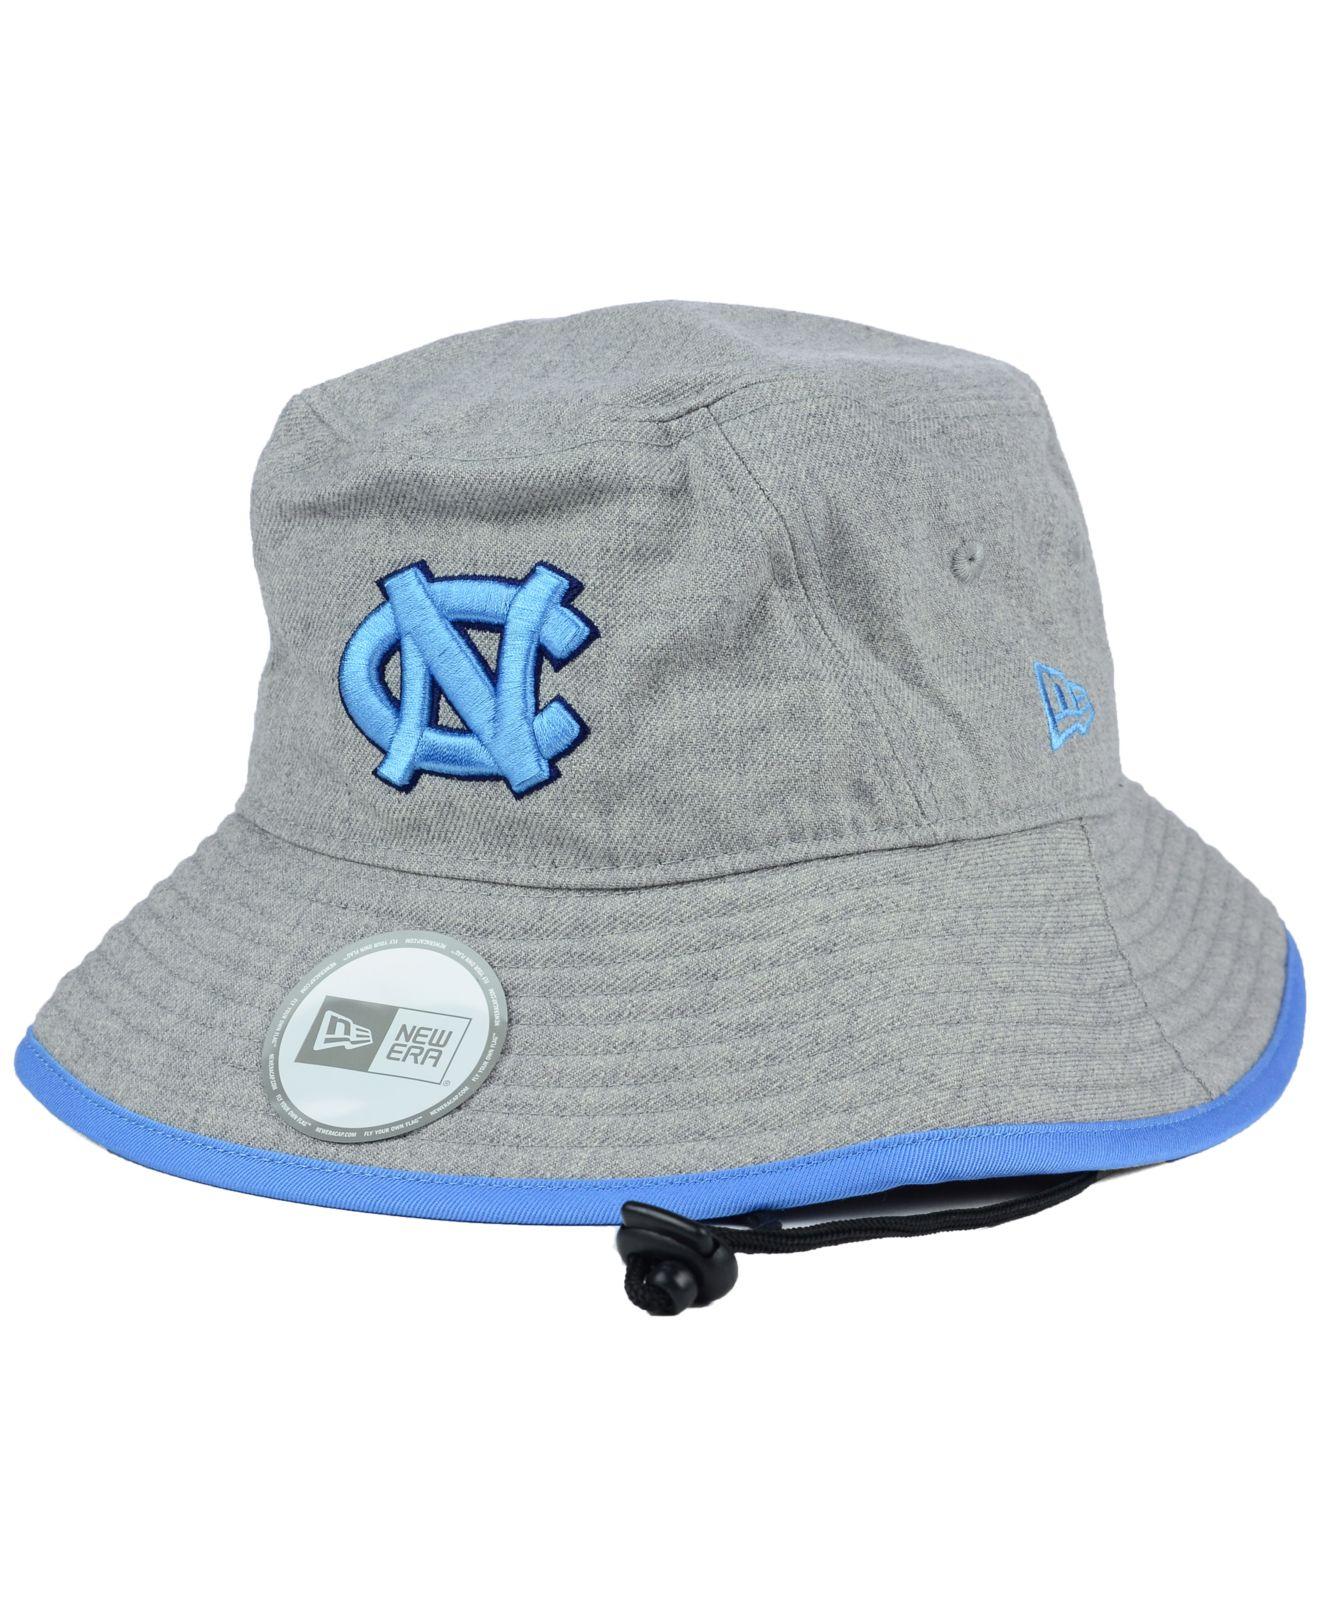 ... low cost lyst ktz north carolina tar heels tip bucket hat in gray for  men 6de88 ... e6260d1a327